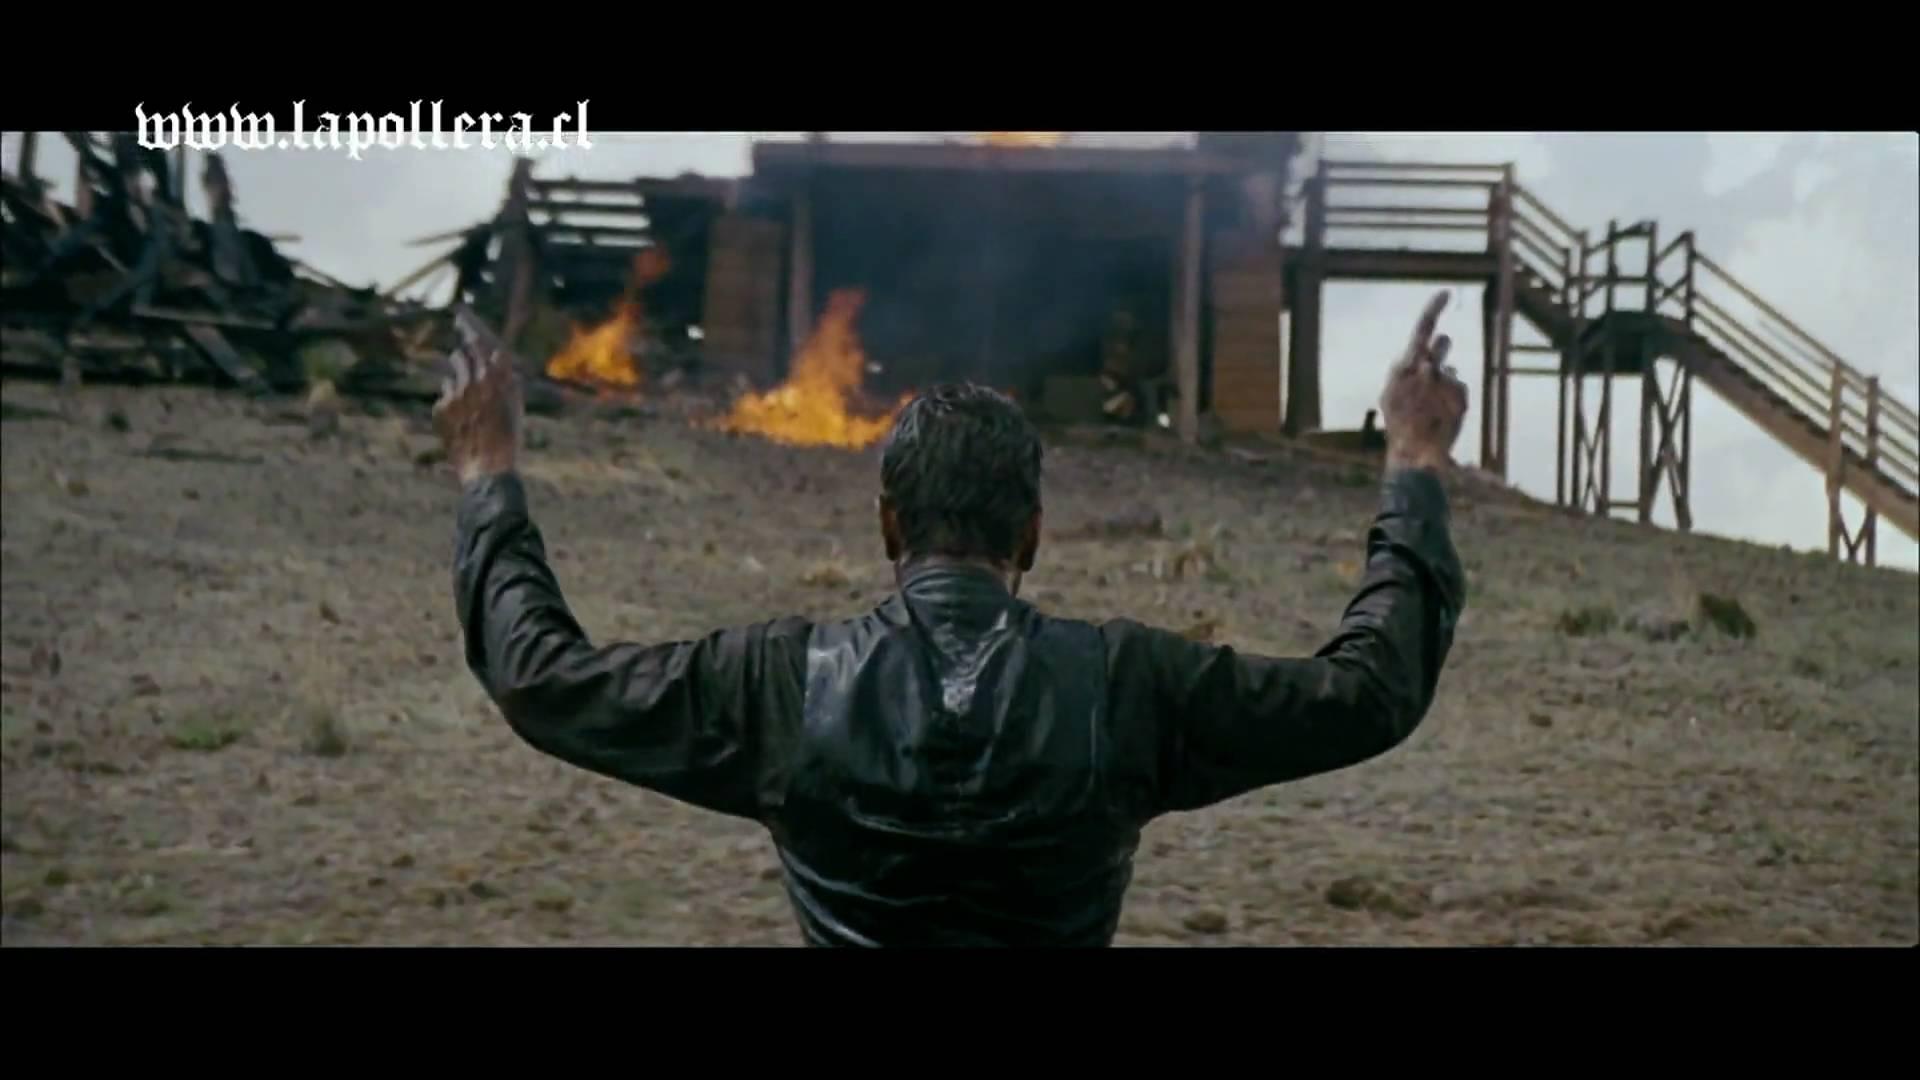 Trailer de There Will be Blood HD subtitulos espaol 1920x1080